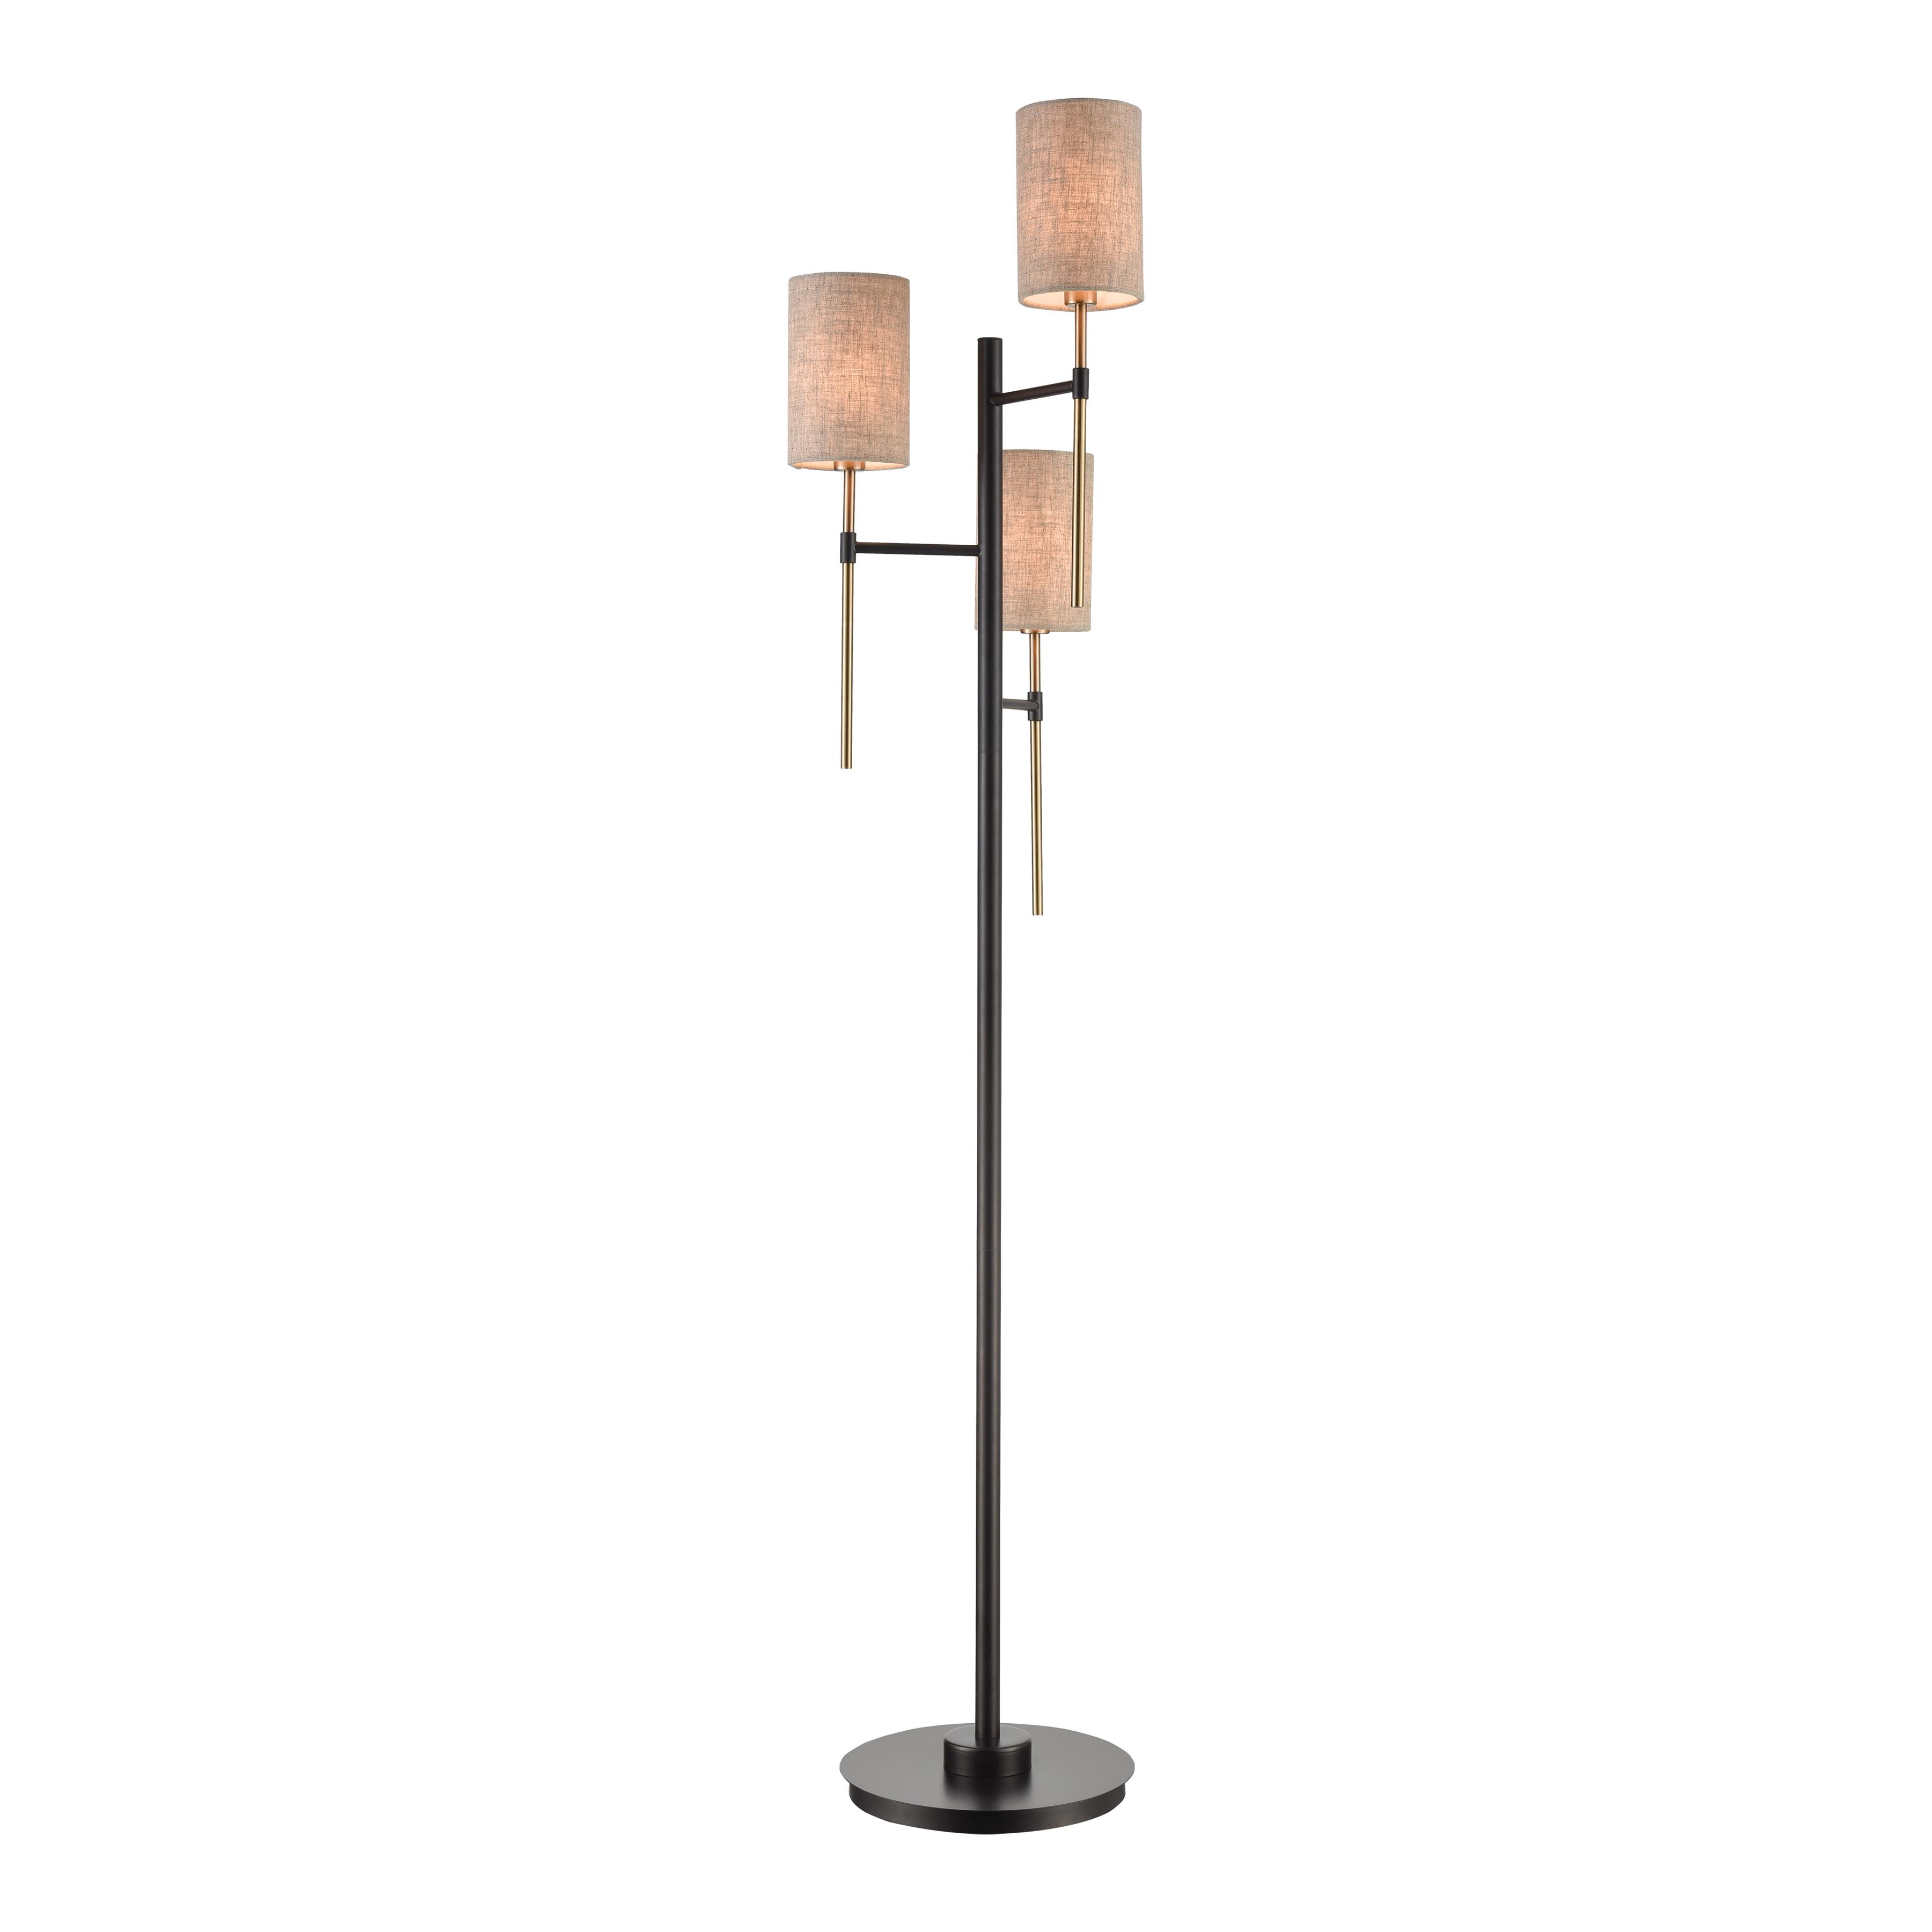 Stein World Trade Wind 3-Light Floor Lamp